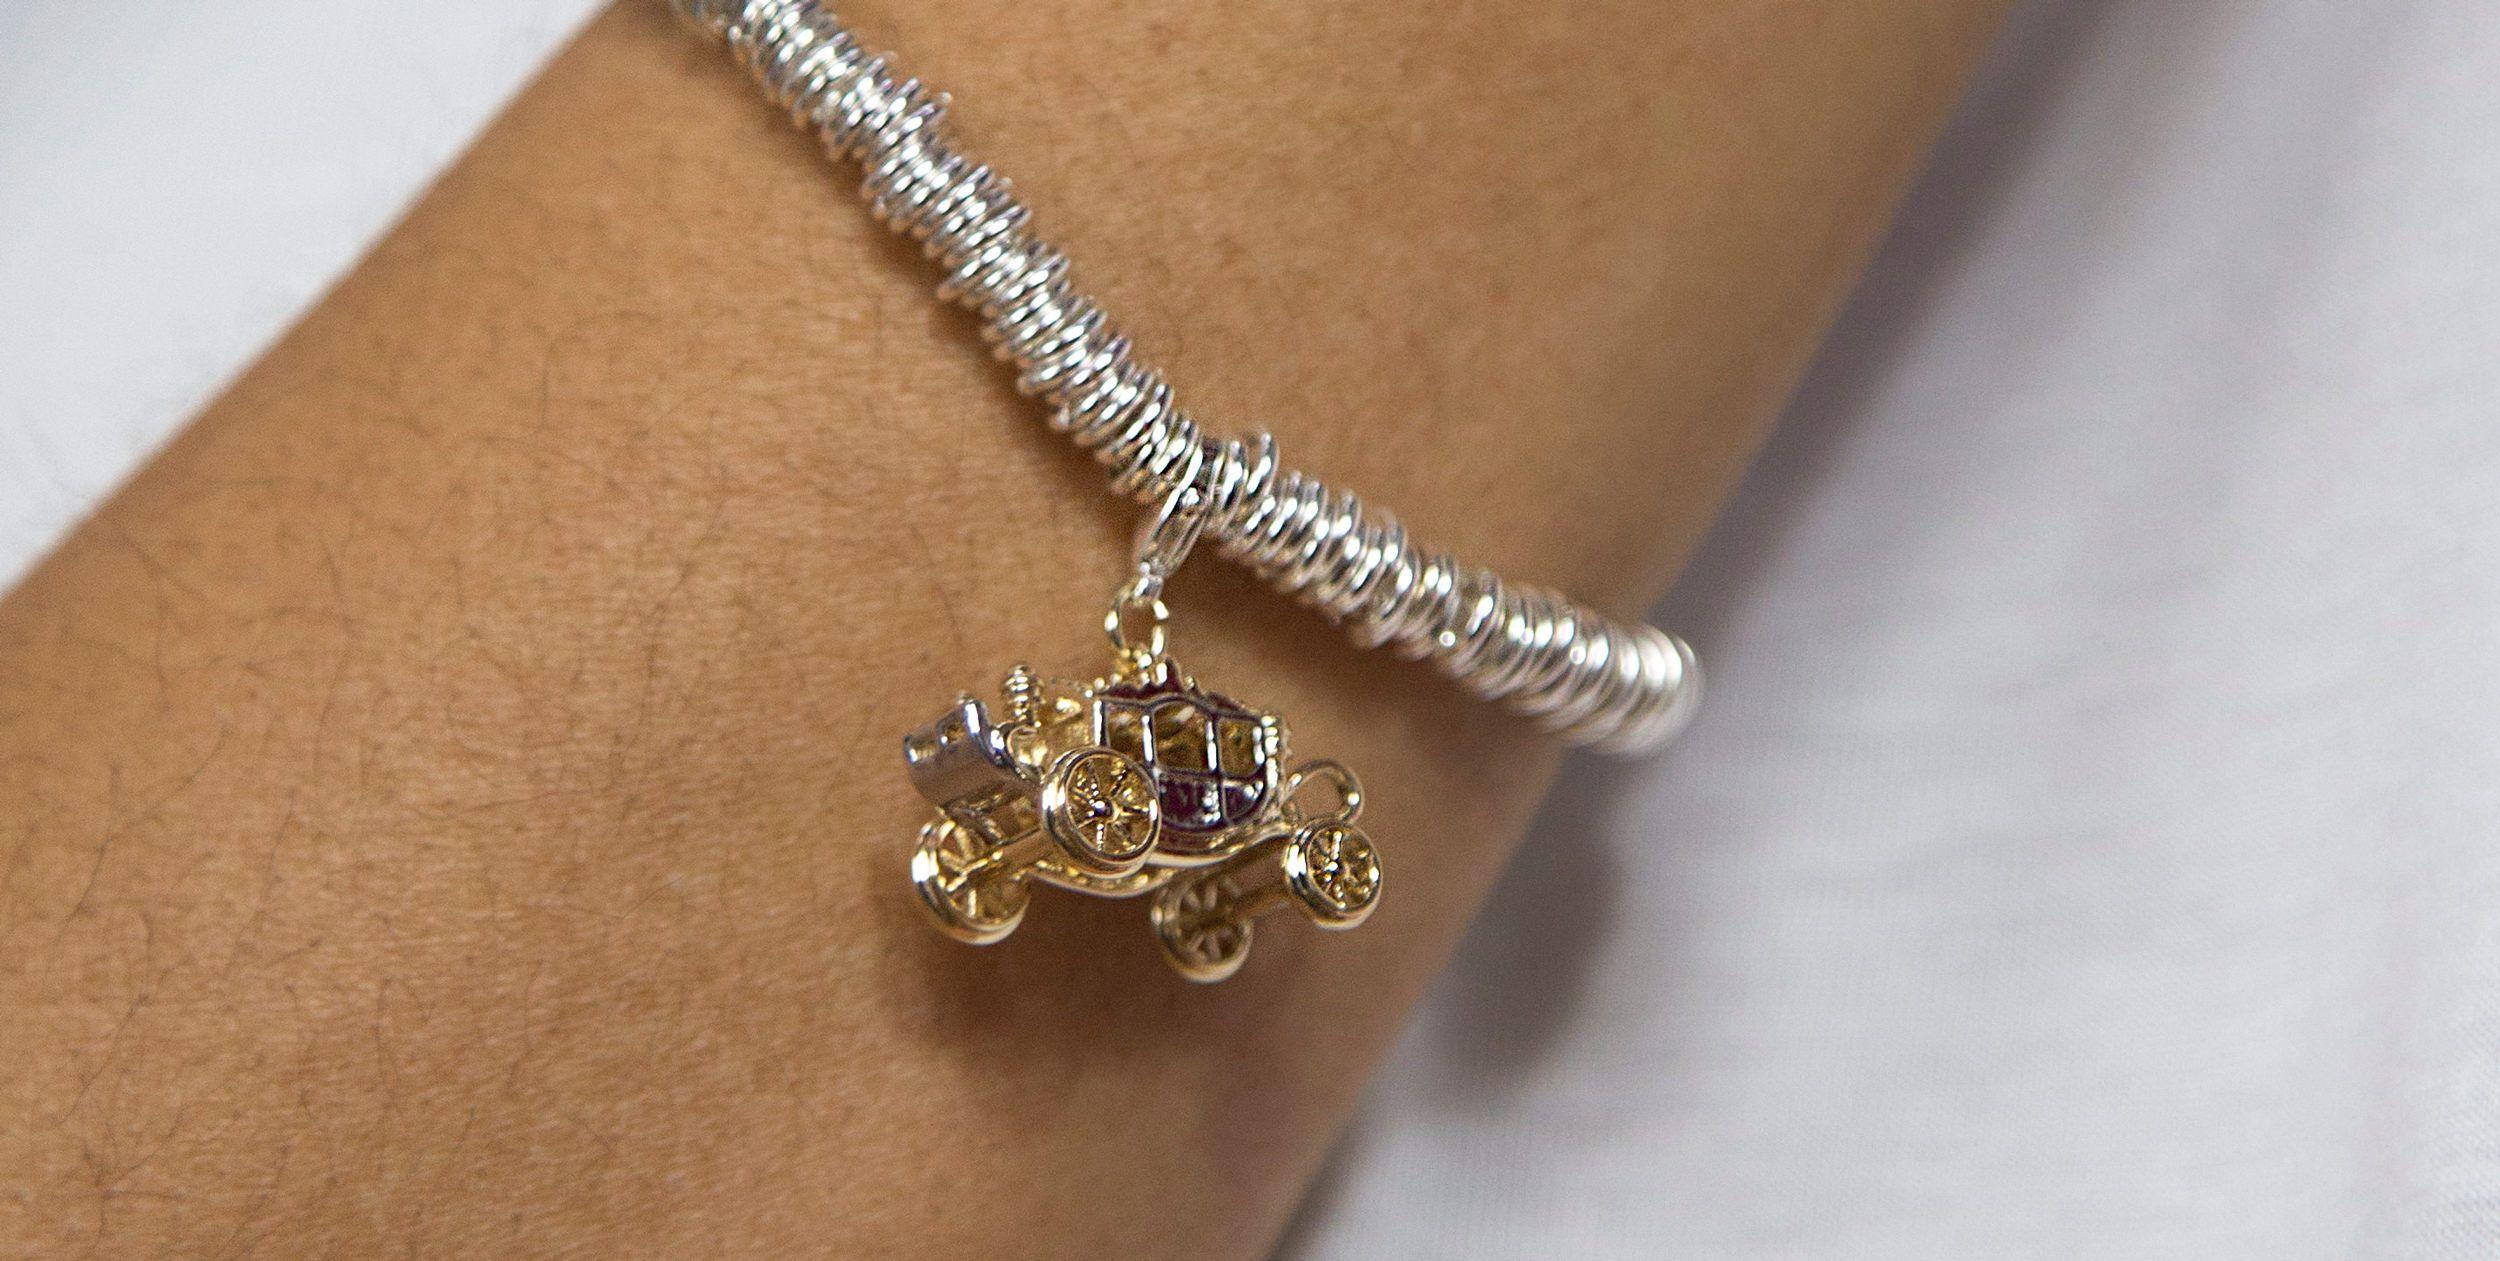 Buckley London Best of British Queen's Carriage Charm Bracelet